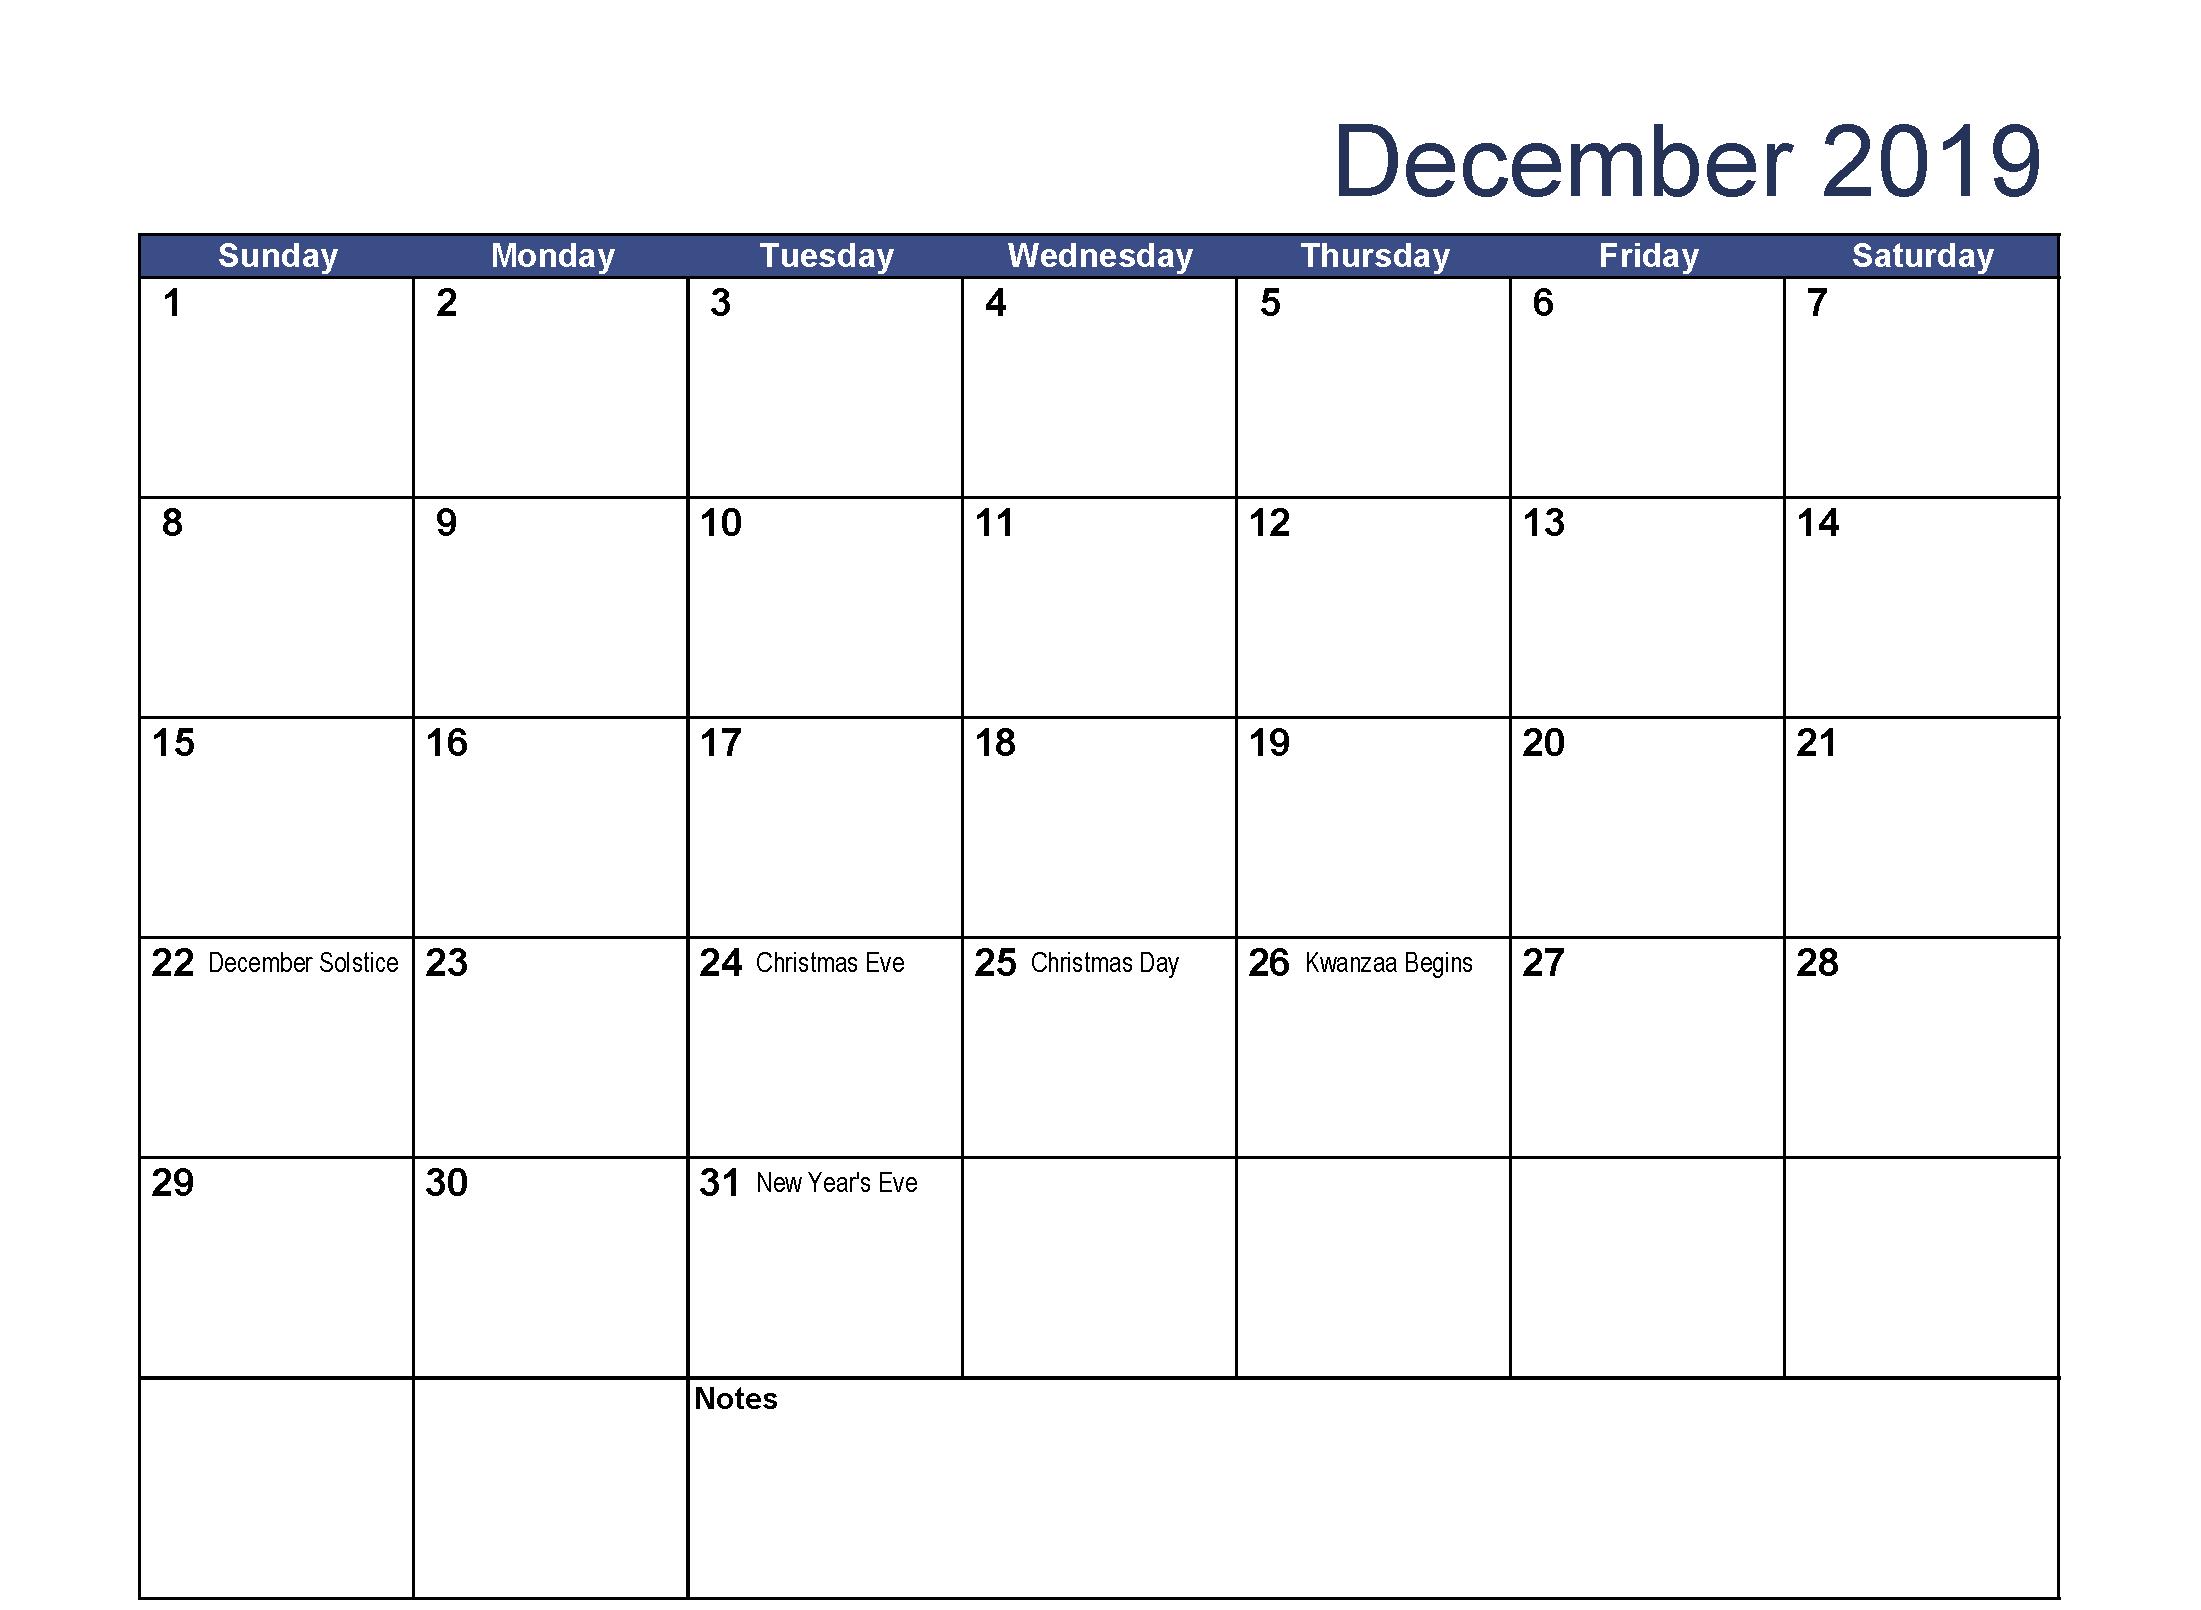 Blank Fillable December 2019 Calendar 2019 Calendar Calendar 2019 With Holidays Free Printable Calendar Templates